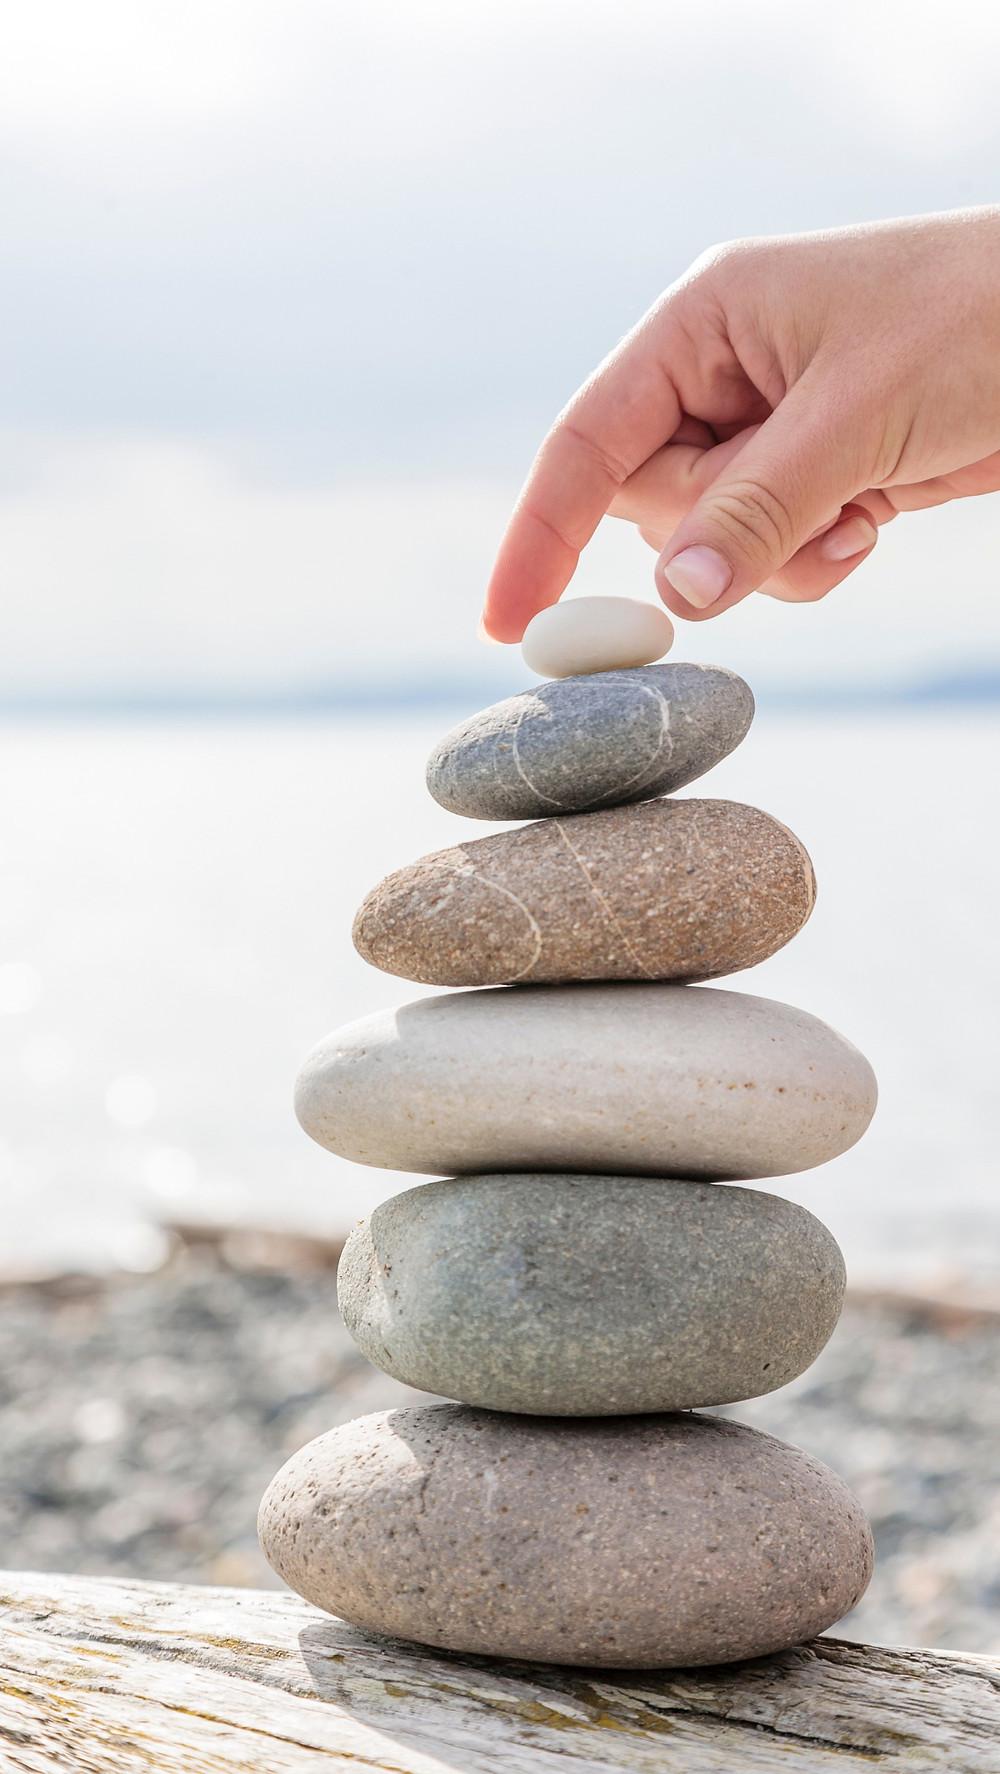 balance body stress relief